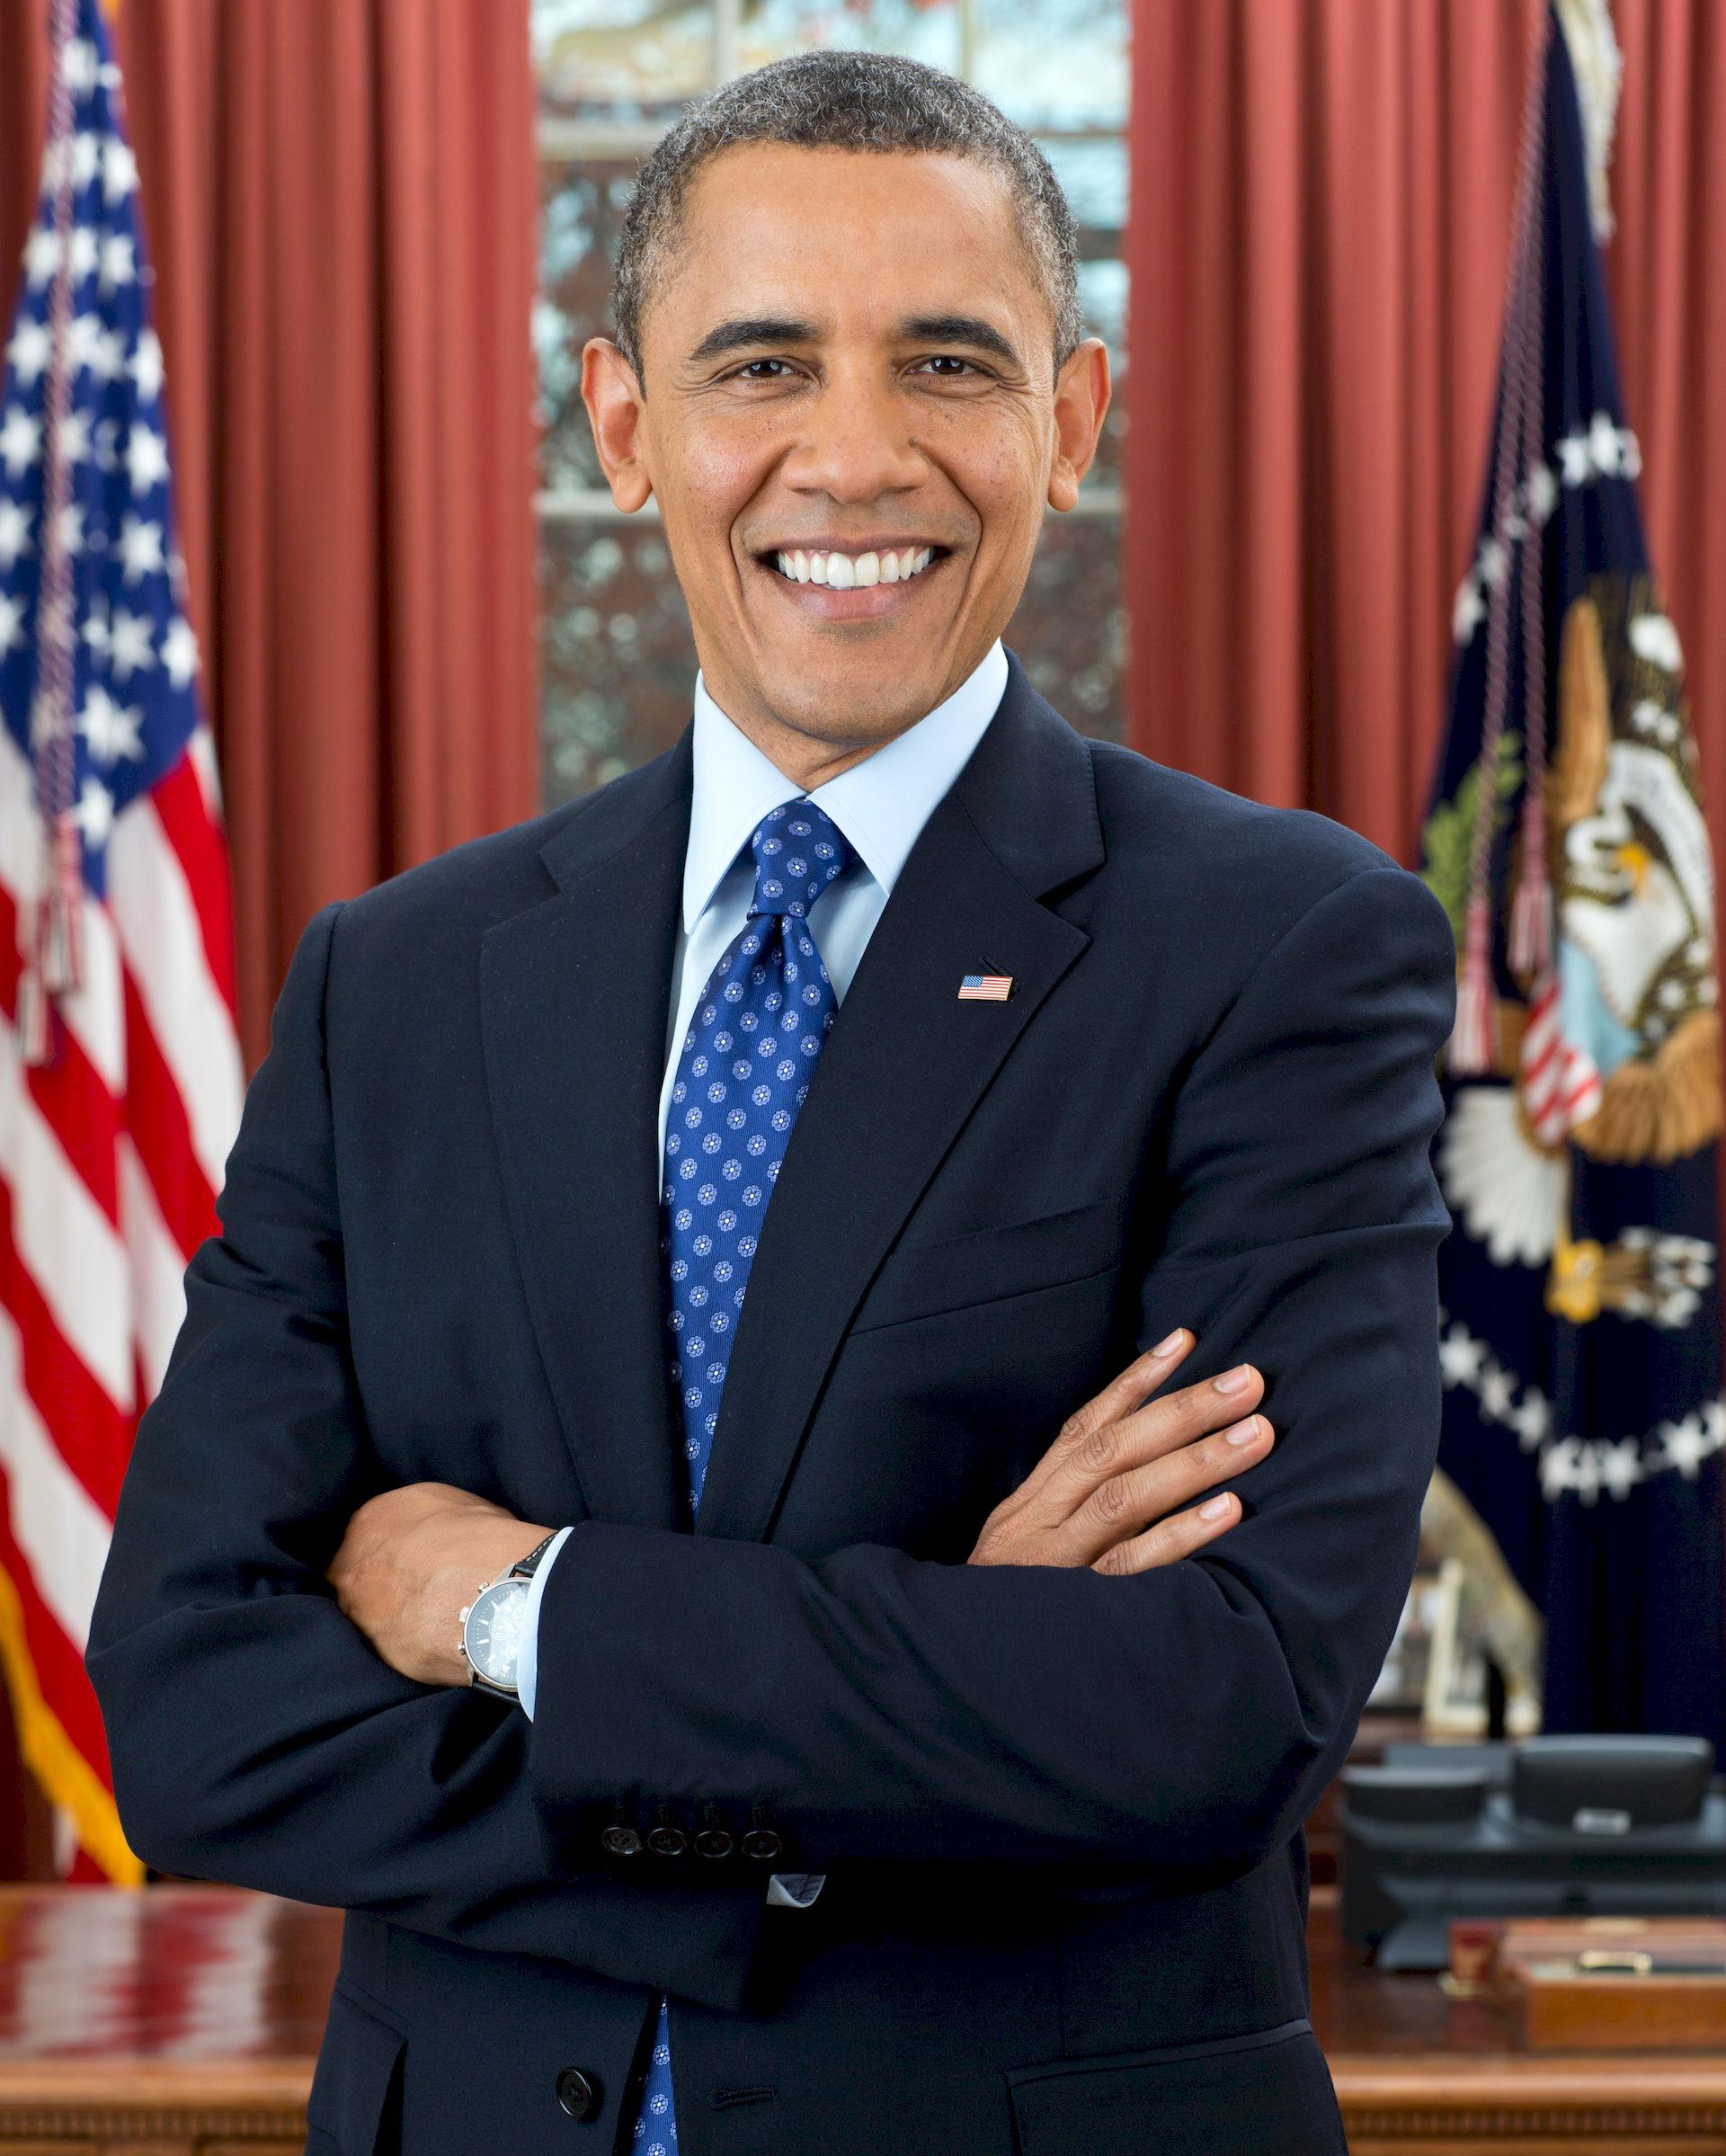 Photo of Barack Obama: 44th President of the United States